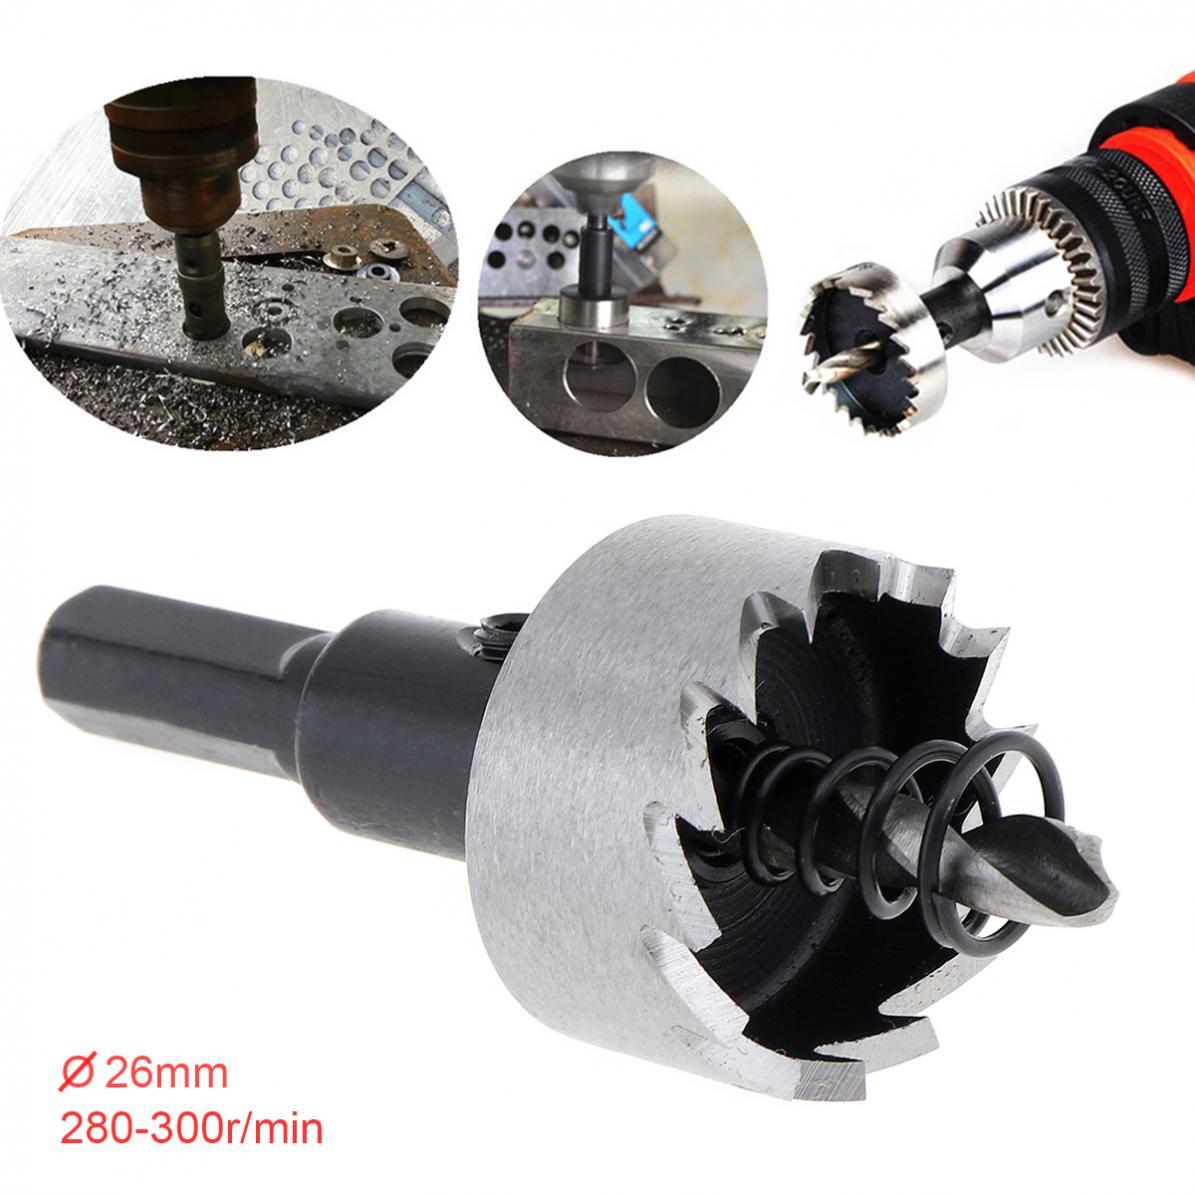 26mm HSS Hole Saw Cutter Drill Bits For Pistol Drills/Bench Drills/Magnetic Drills/Air Gun Drills